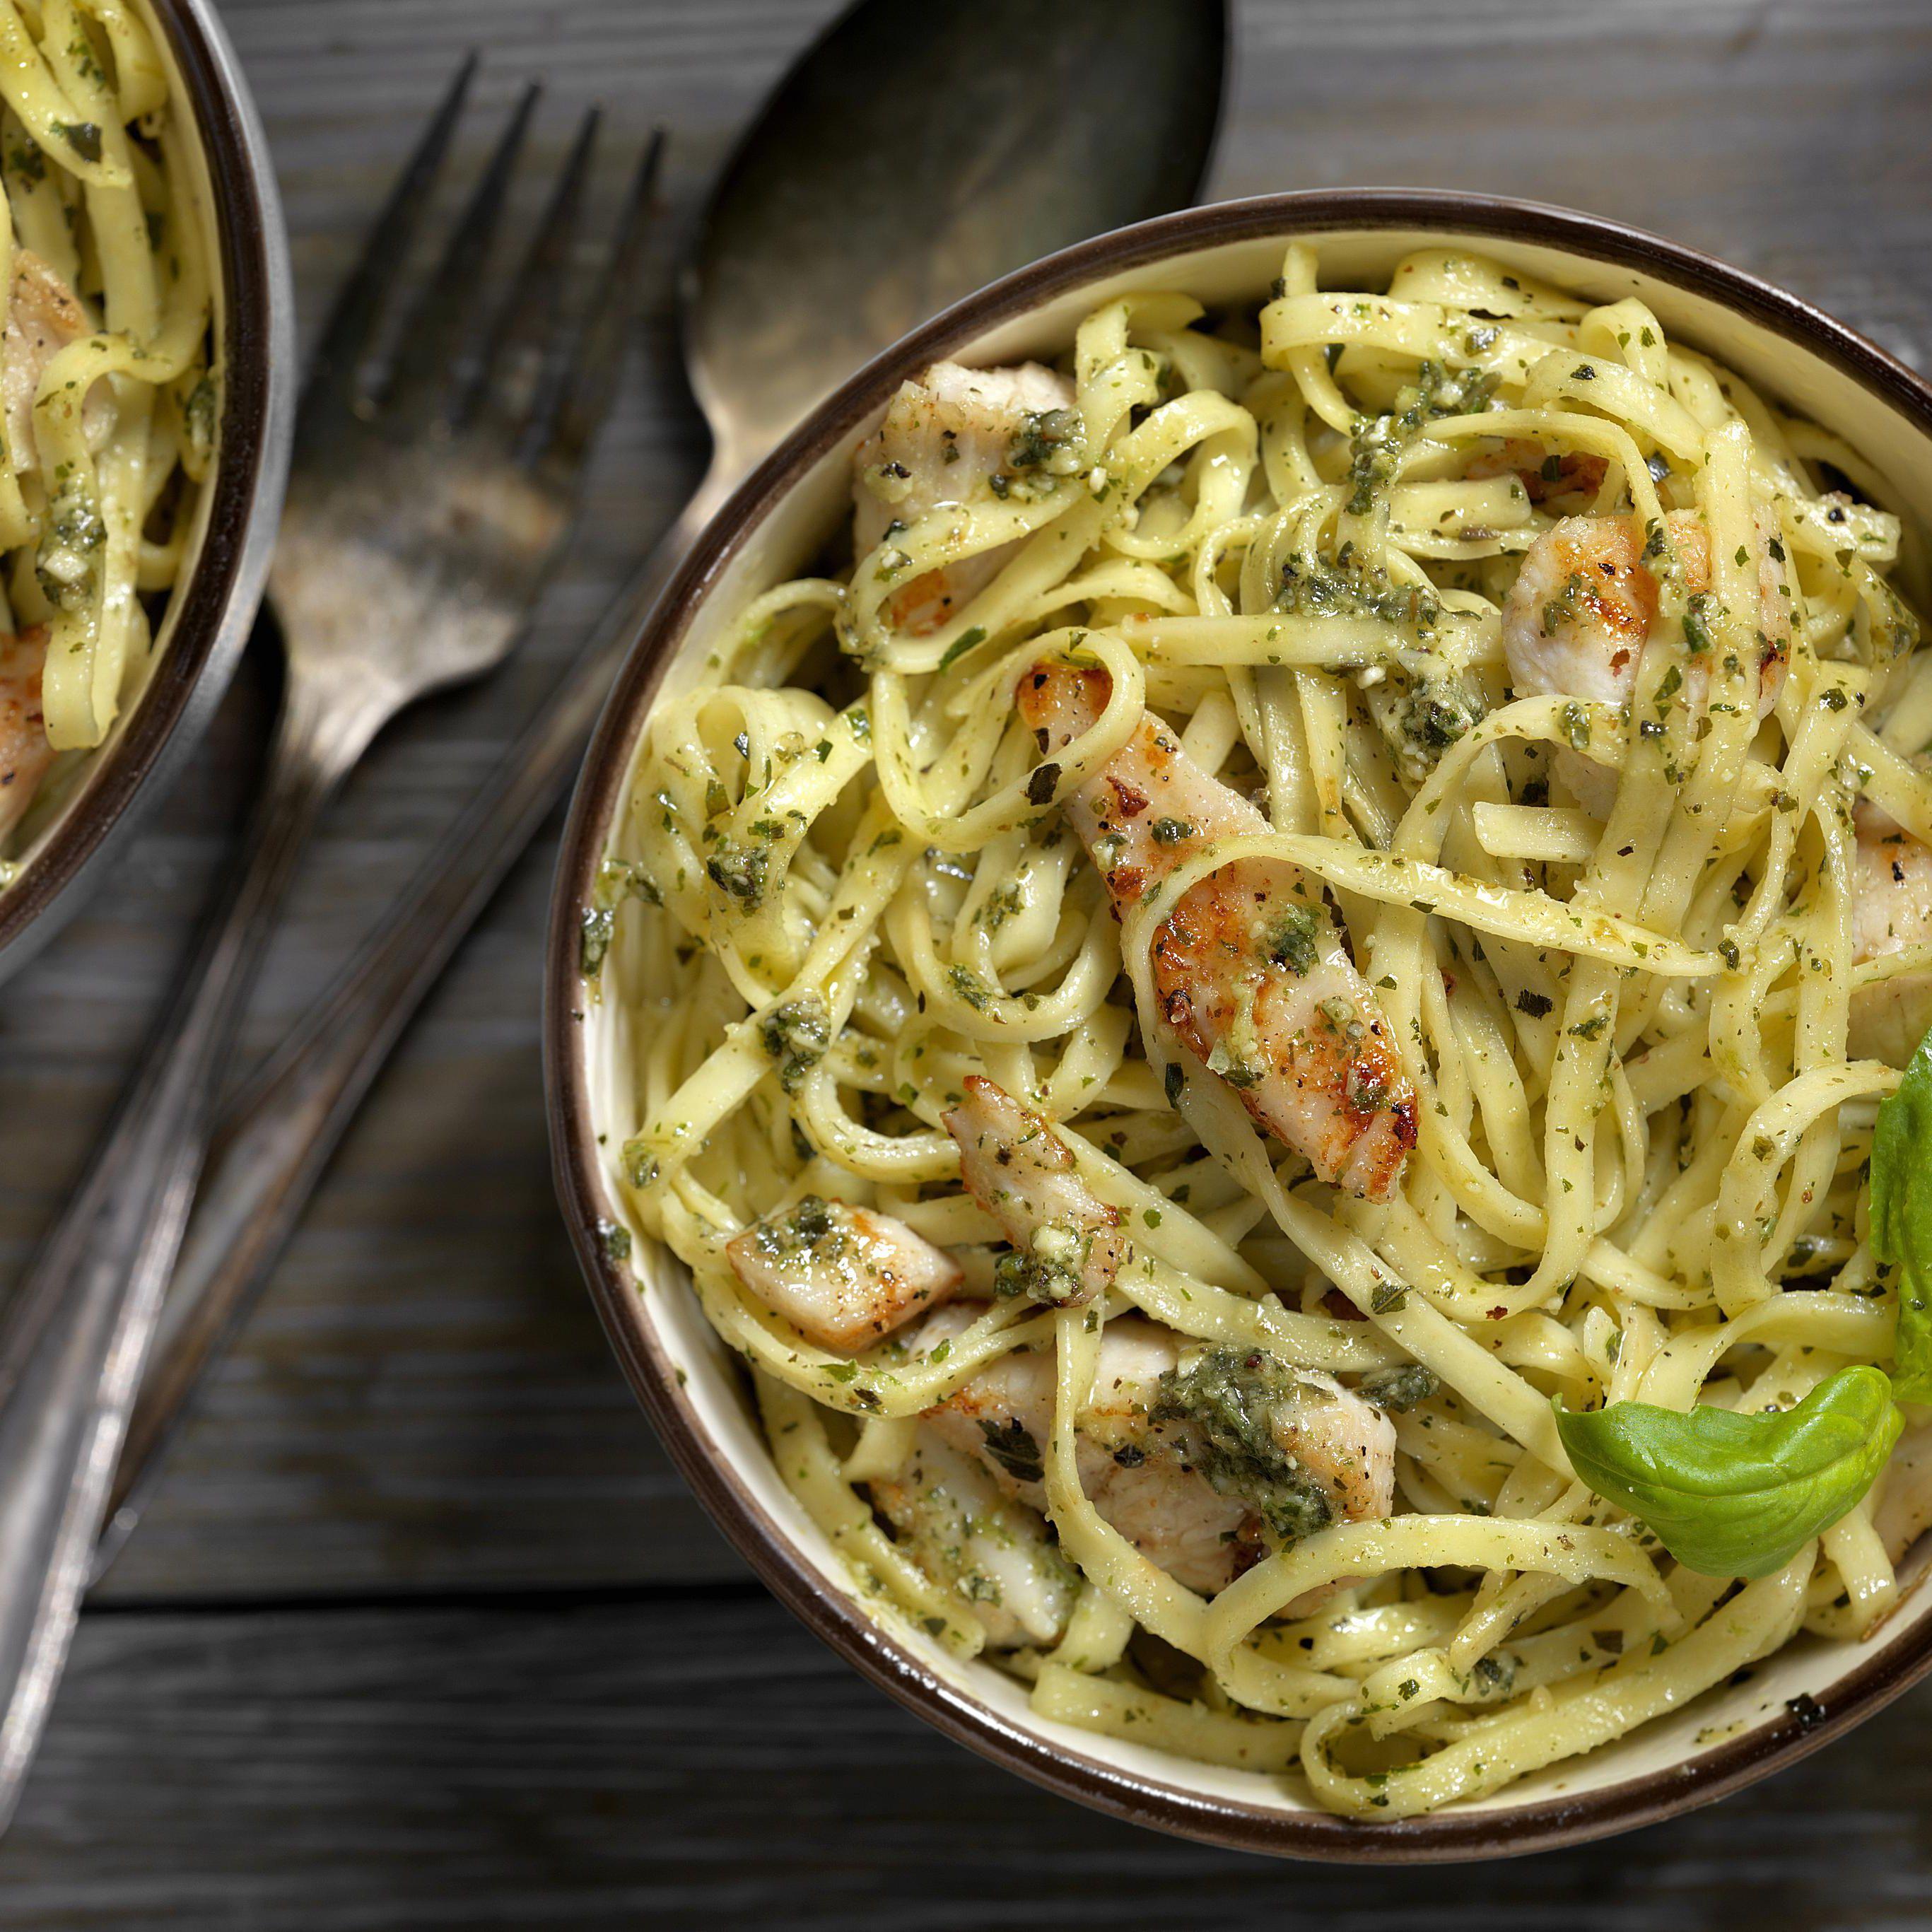 Chicken and Pasta With Lemon Pesto Recipe